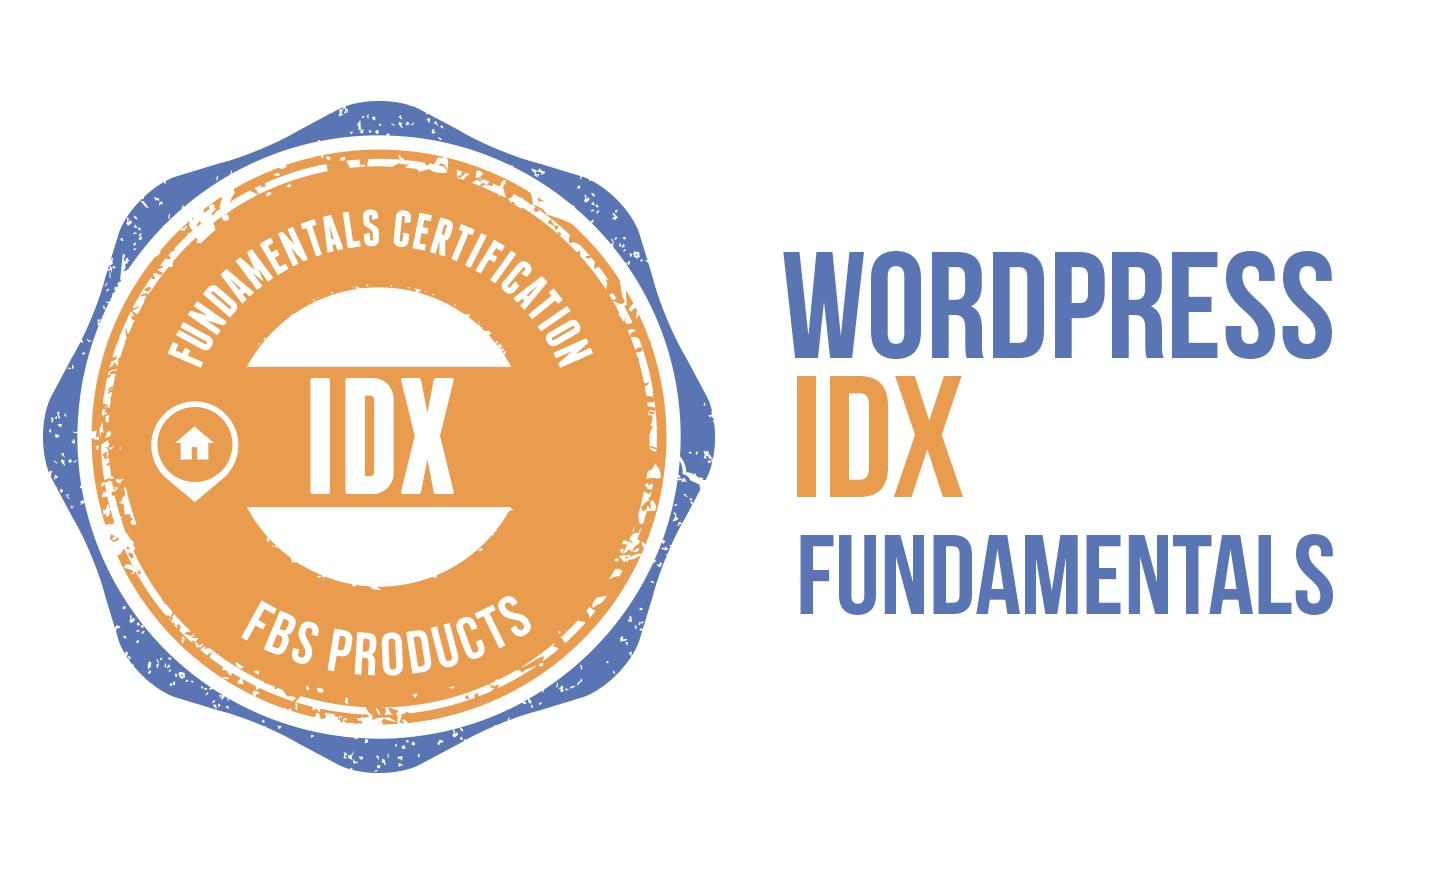 wordpress idx plugin fundamentals